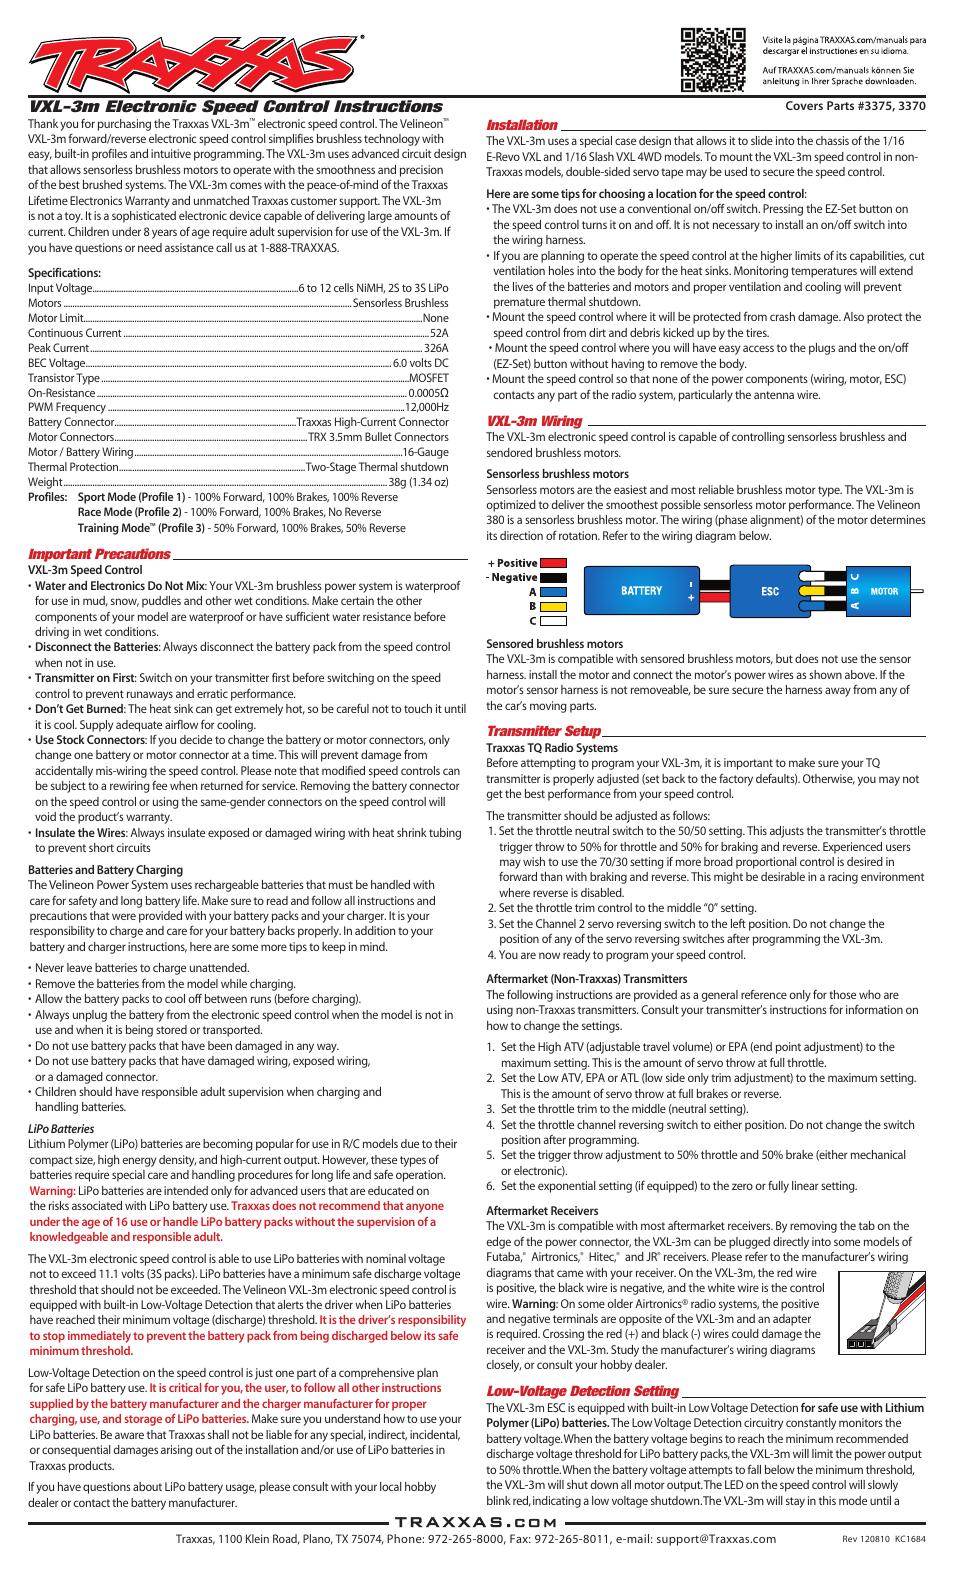 Traxxas 3370 VXL-3m ESC User Manual | 8 pages | Also for: 3375 VXL-3m ESC